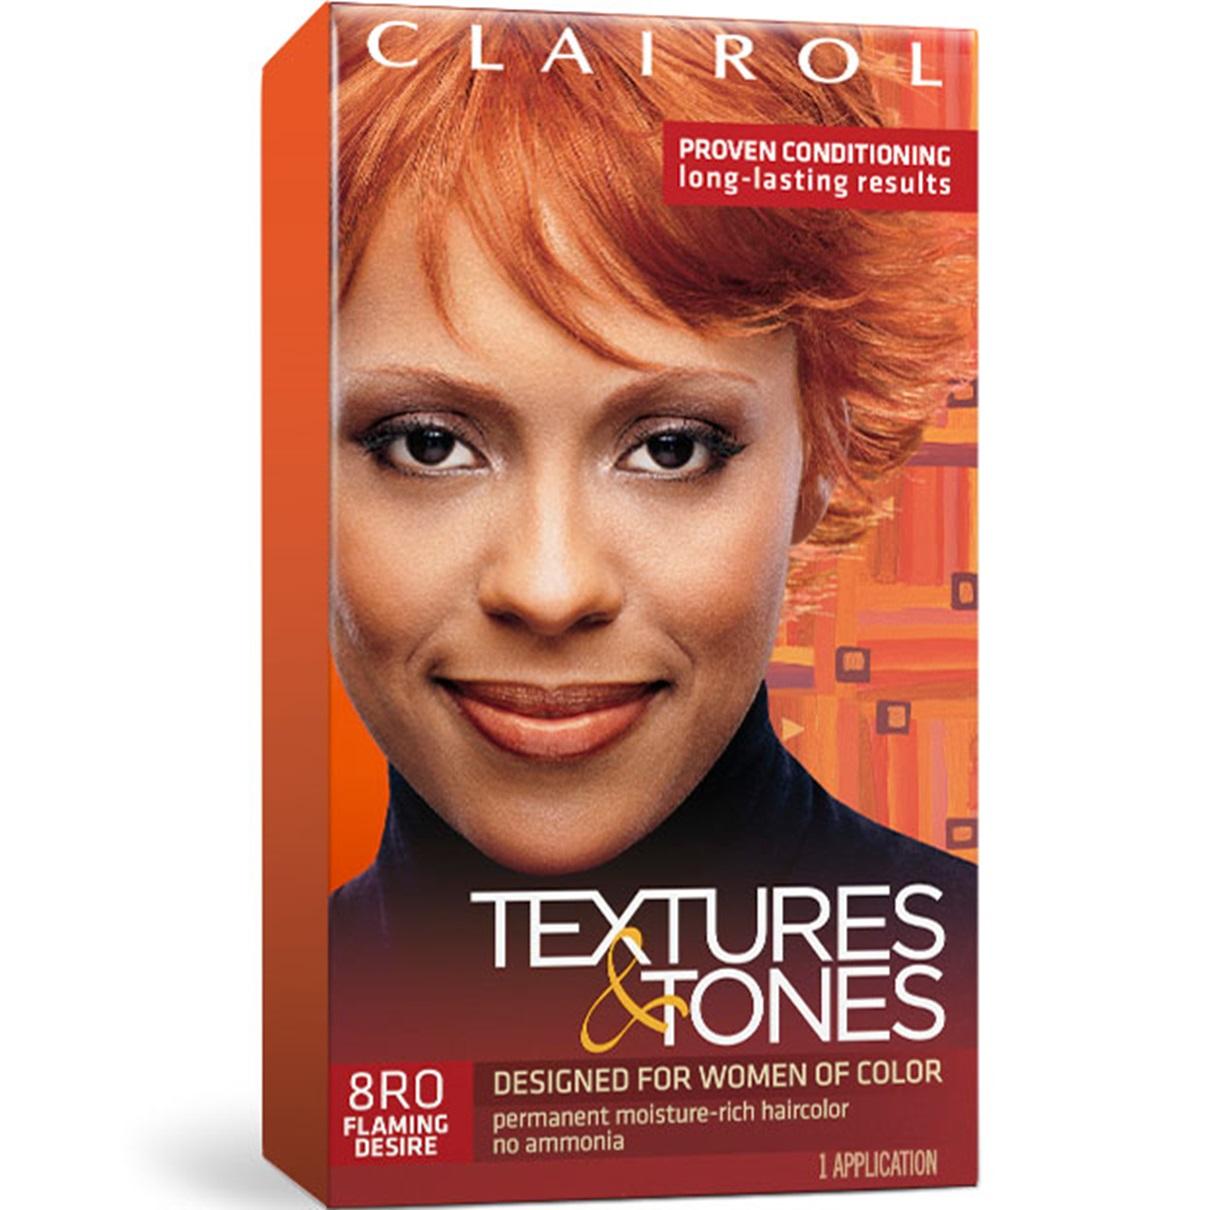 Clairol Textures Amp Tones Permanent Hair Color Dye Kit 1 Application